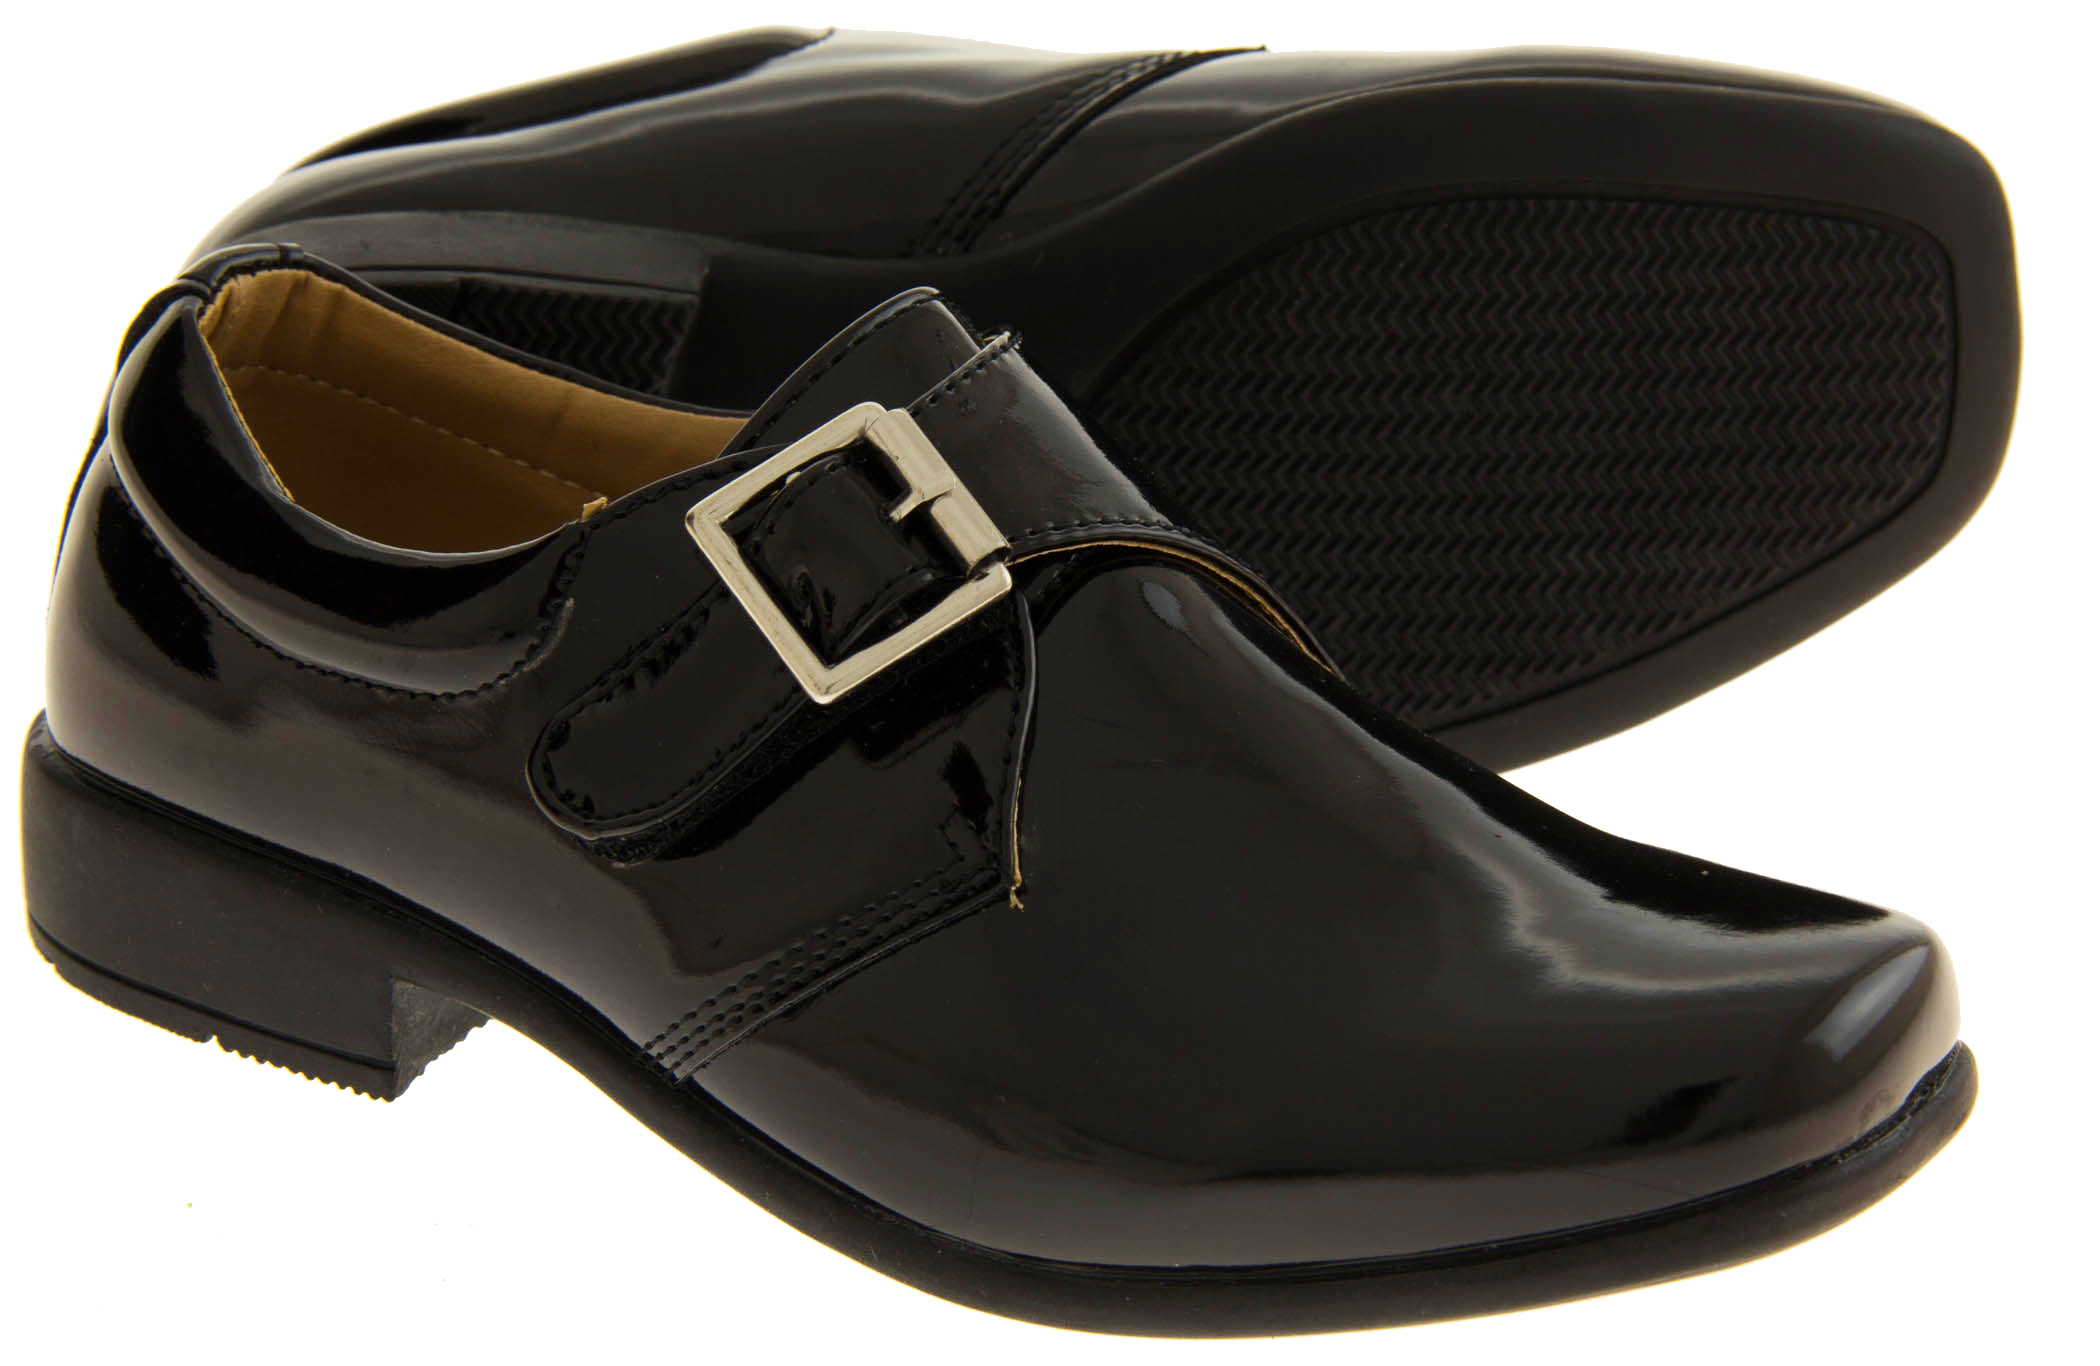 797ff506508d Sentinel NEW Young Boys Black Patent Matt Monk Formal School Party Shoes Sz  Size 10 11 12